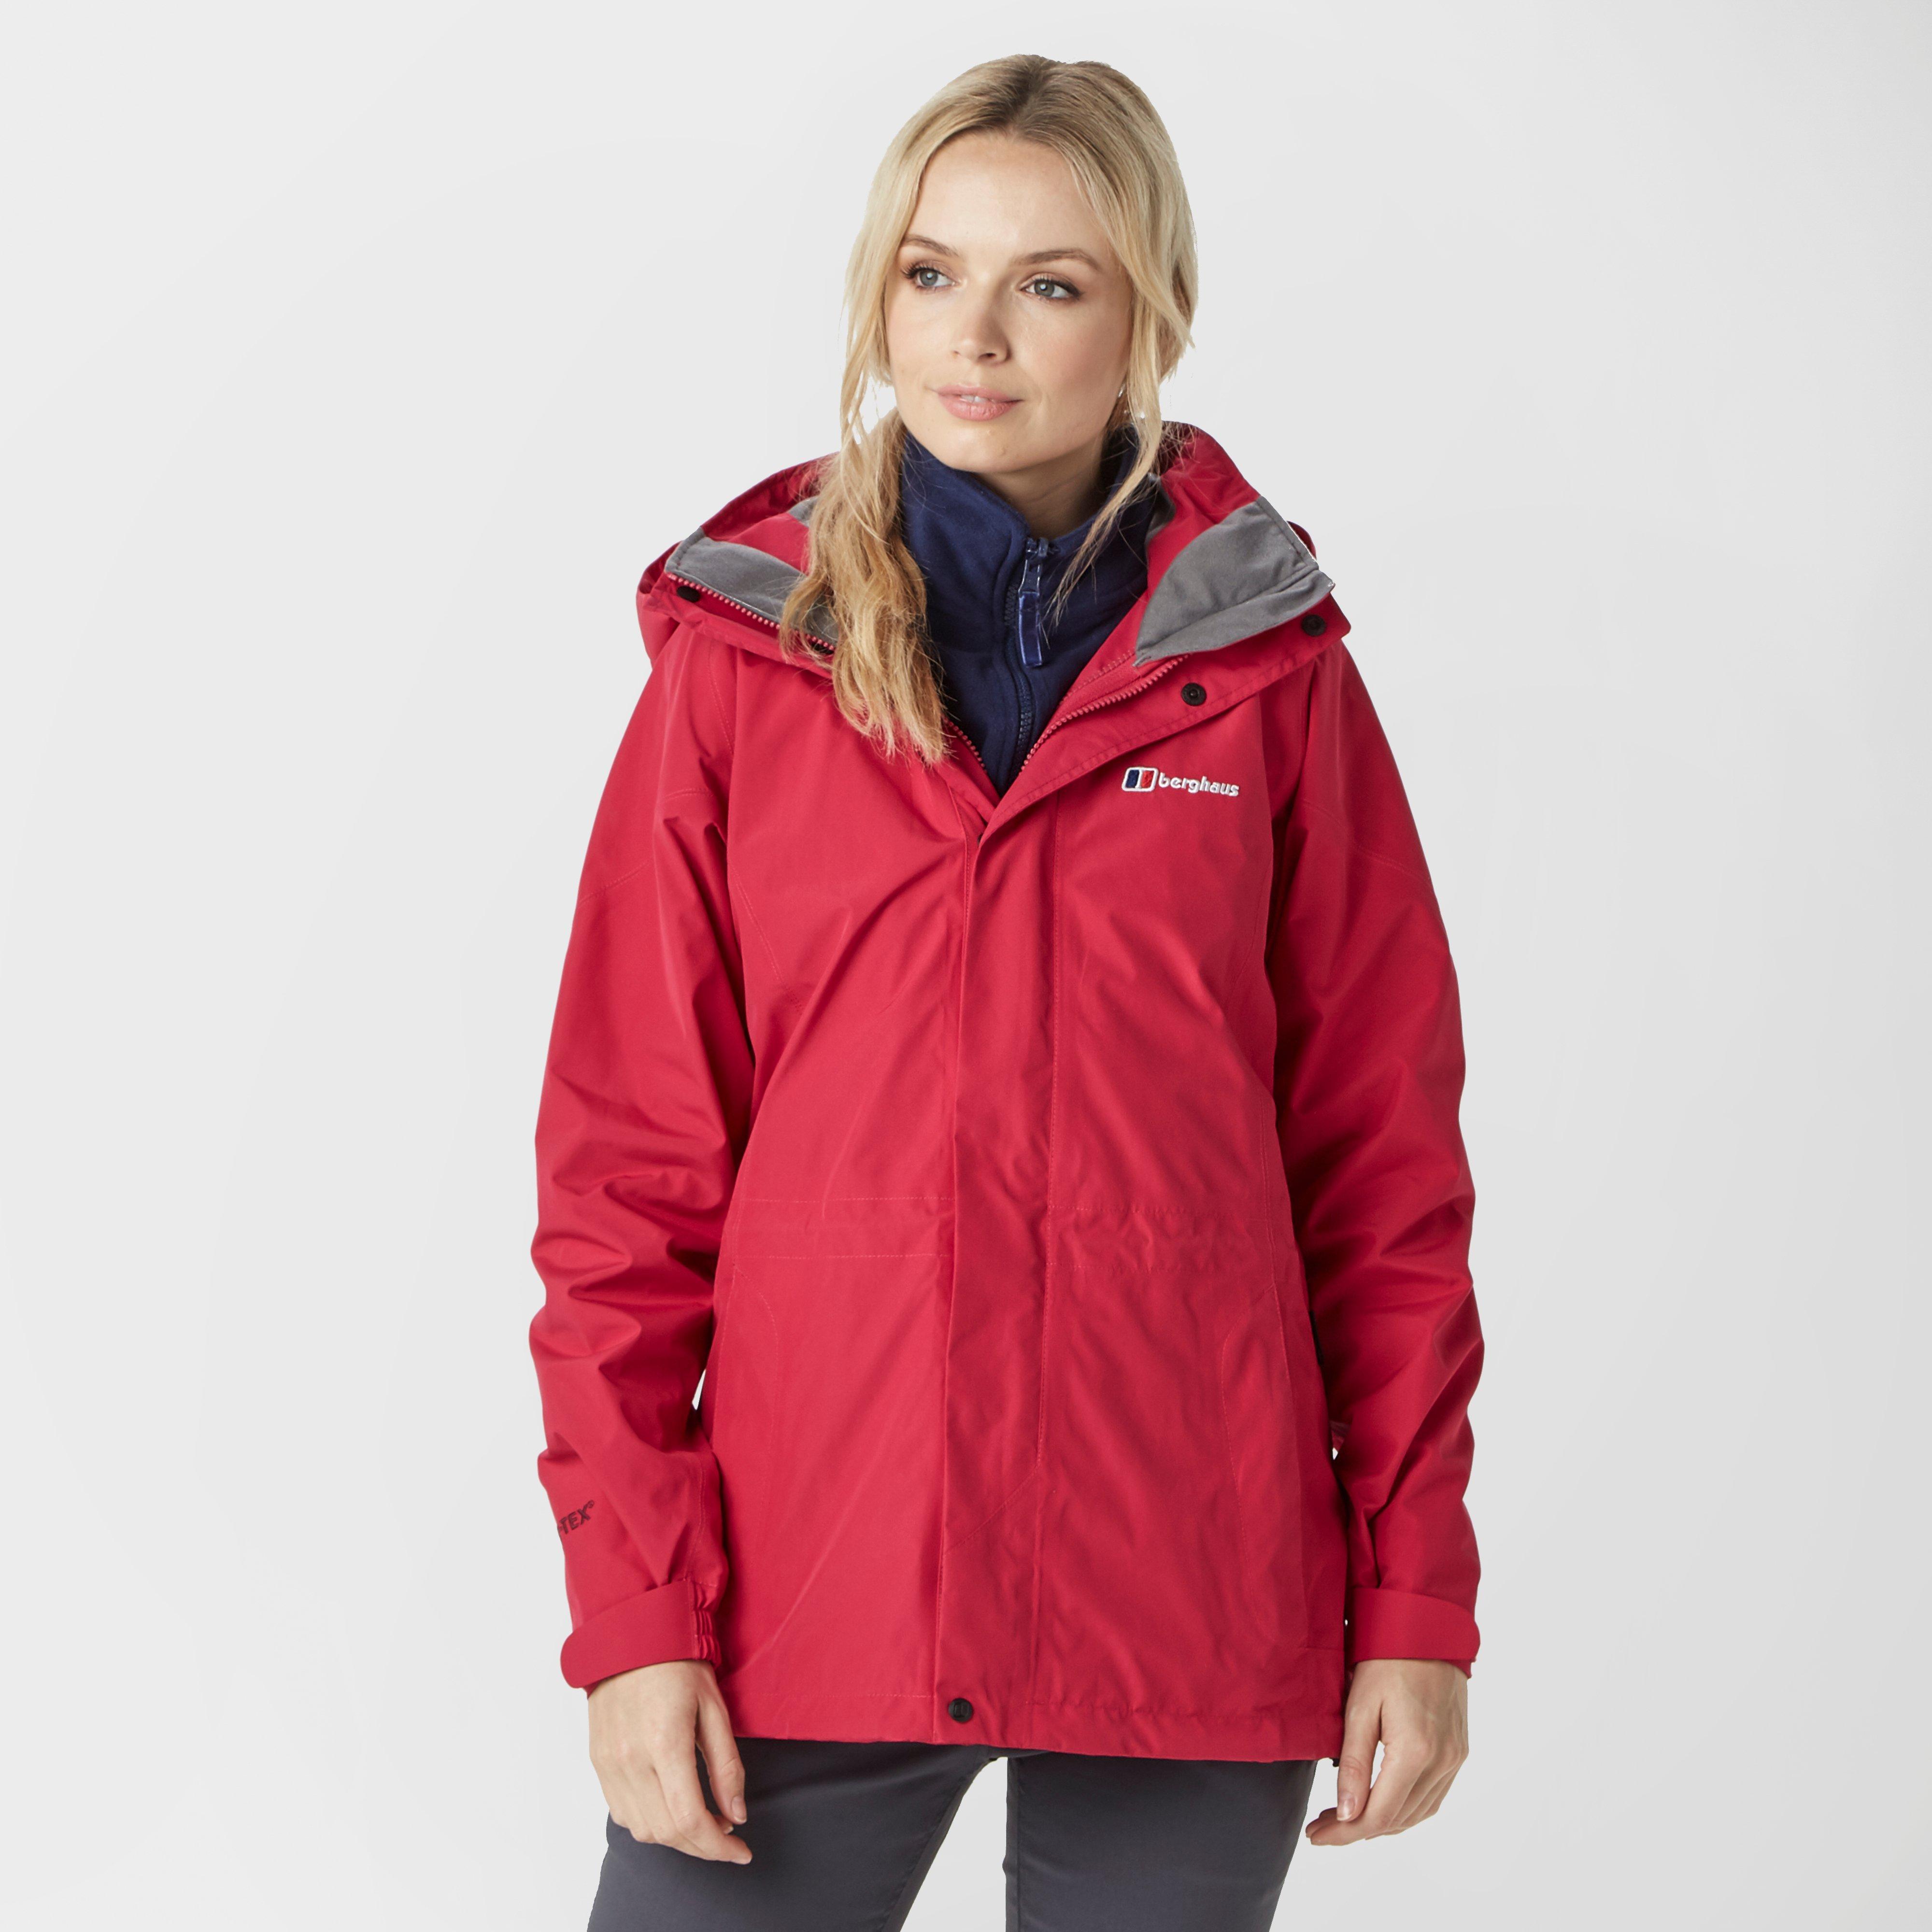 fc0e55b578af3 Berghaus Women s Glissade III GORE-TEX Jacket